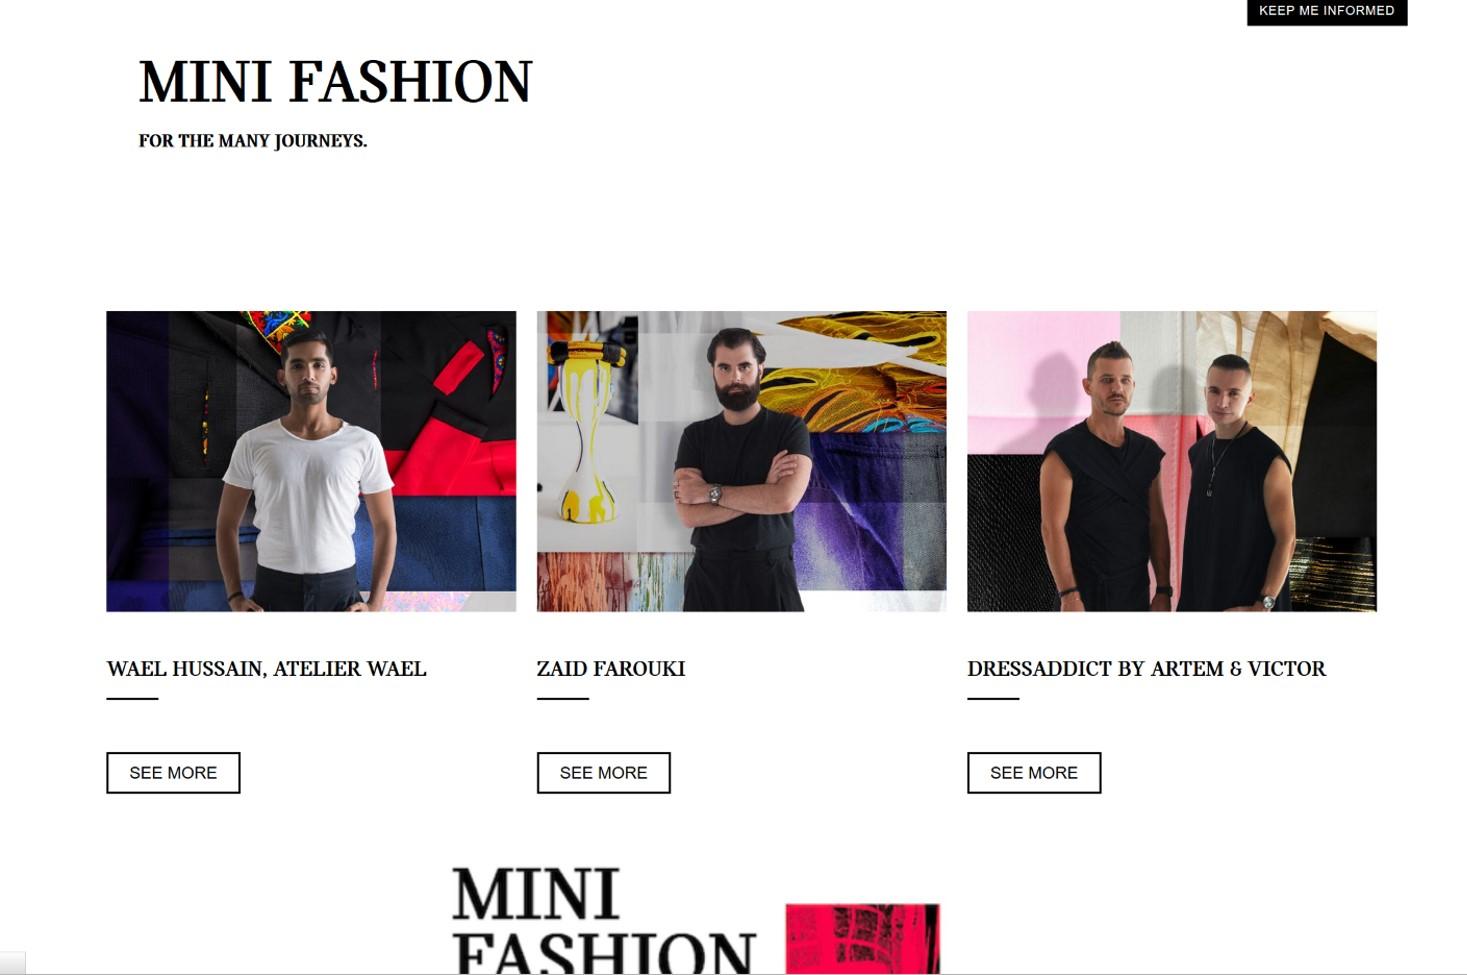 SPME_MINI_Fashion_04.jpg